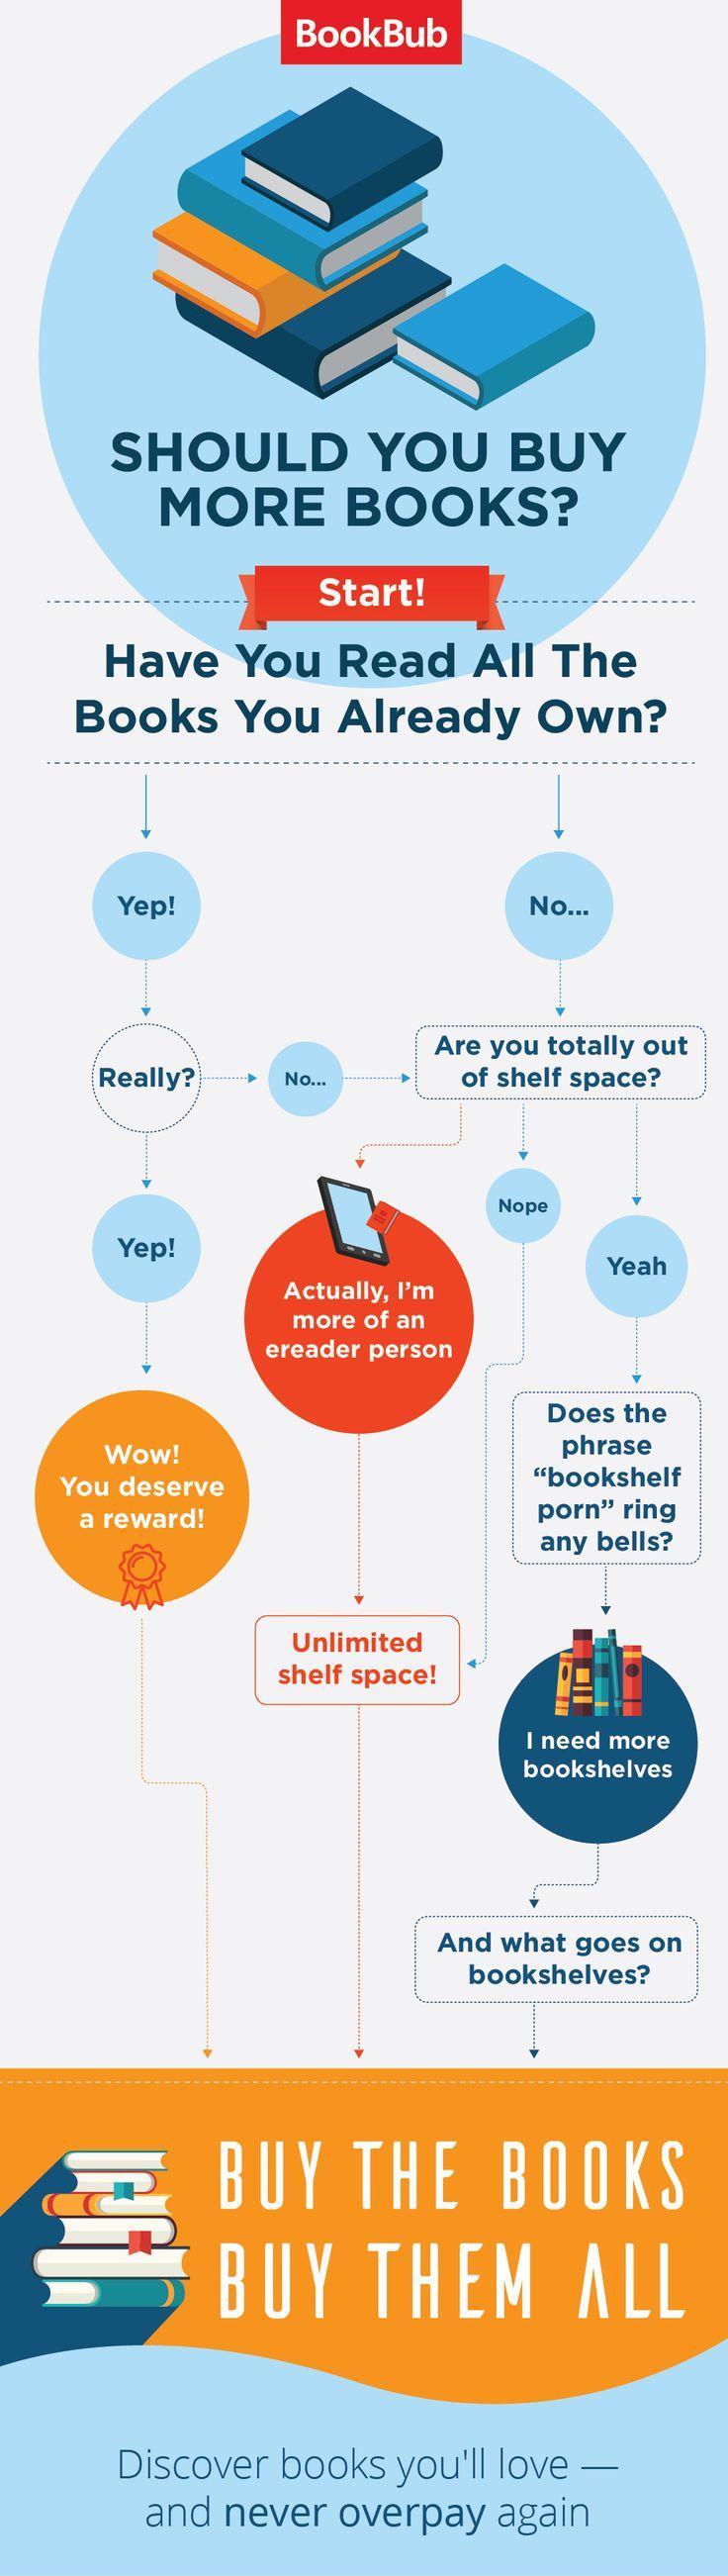 buy books info graphic